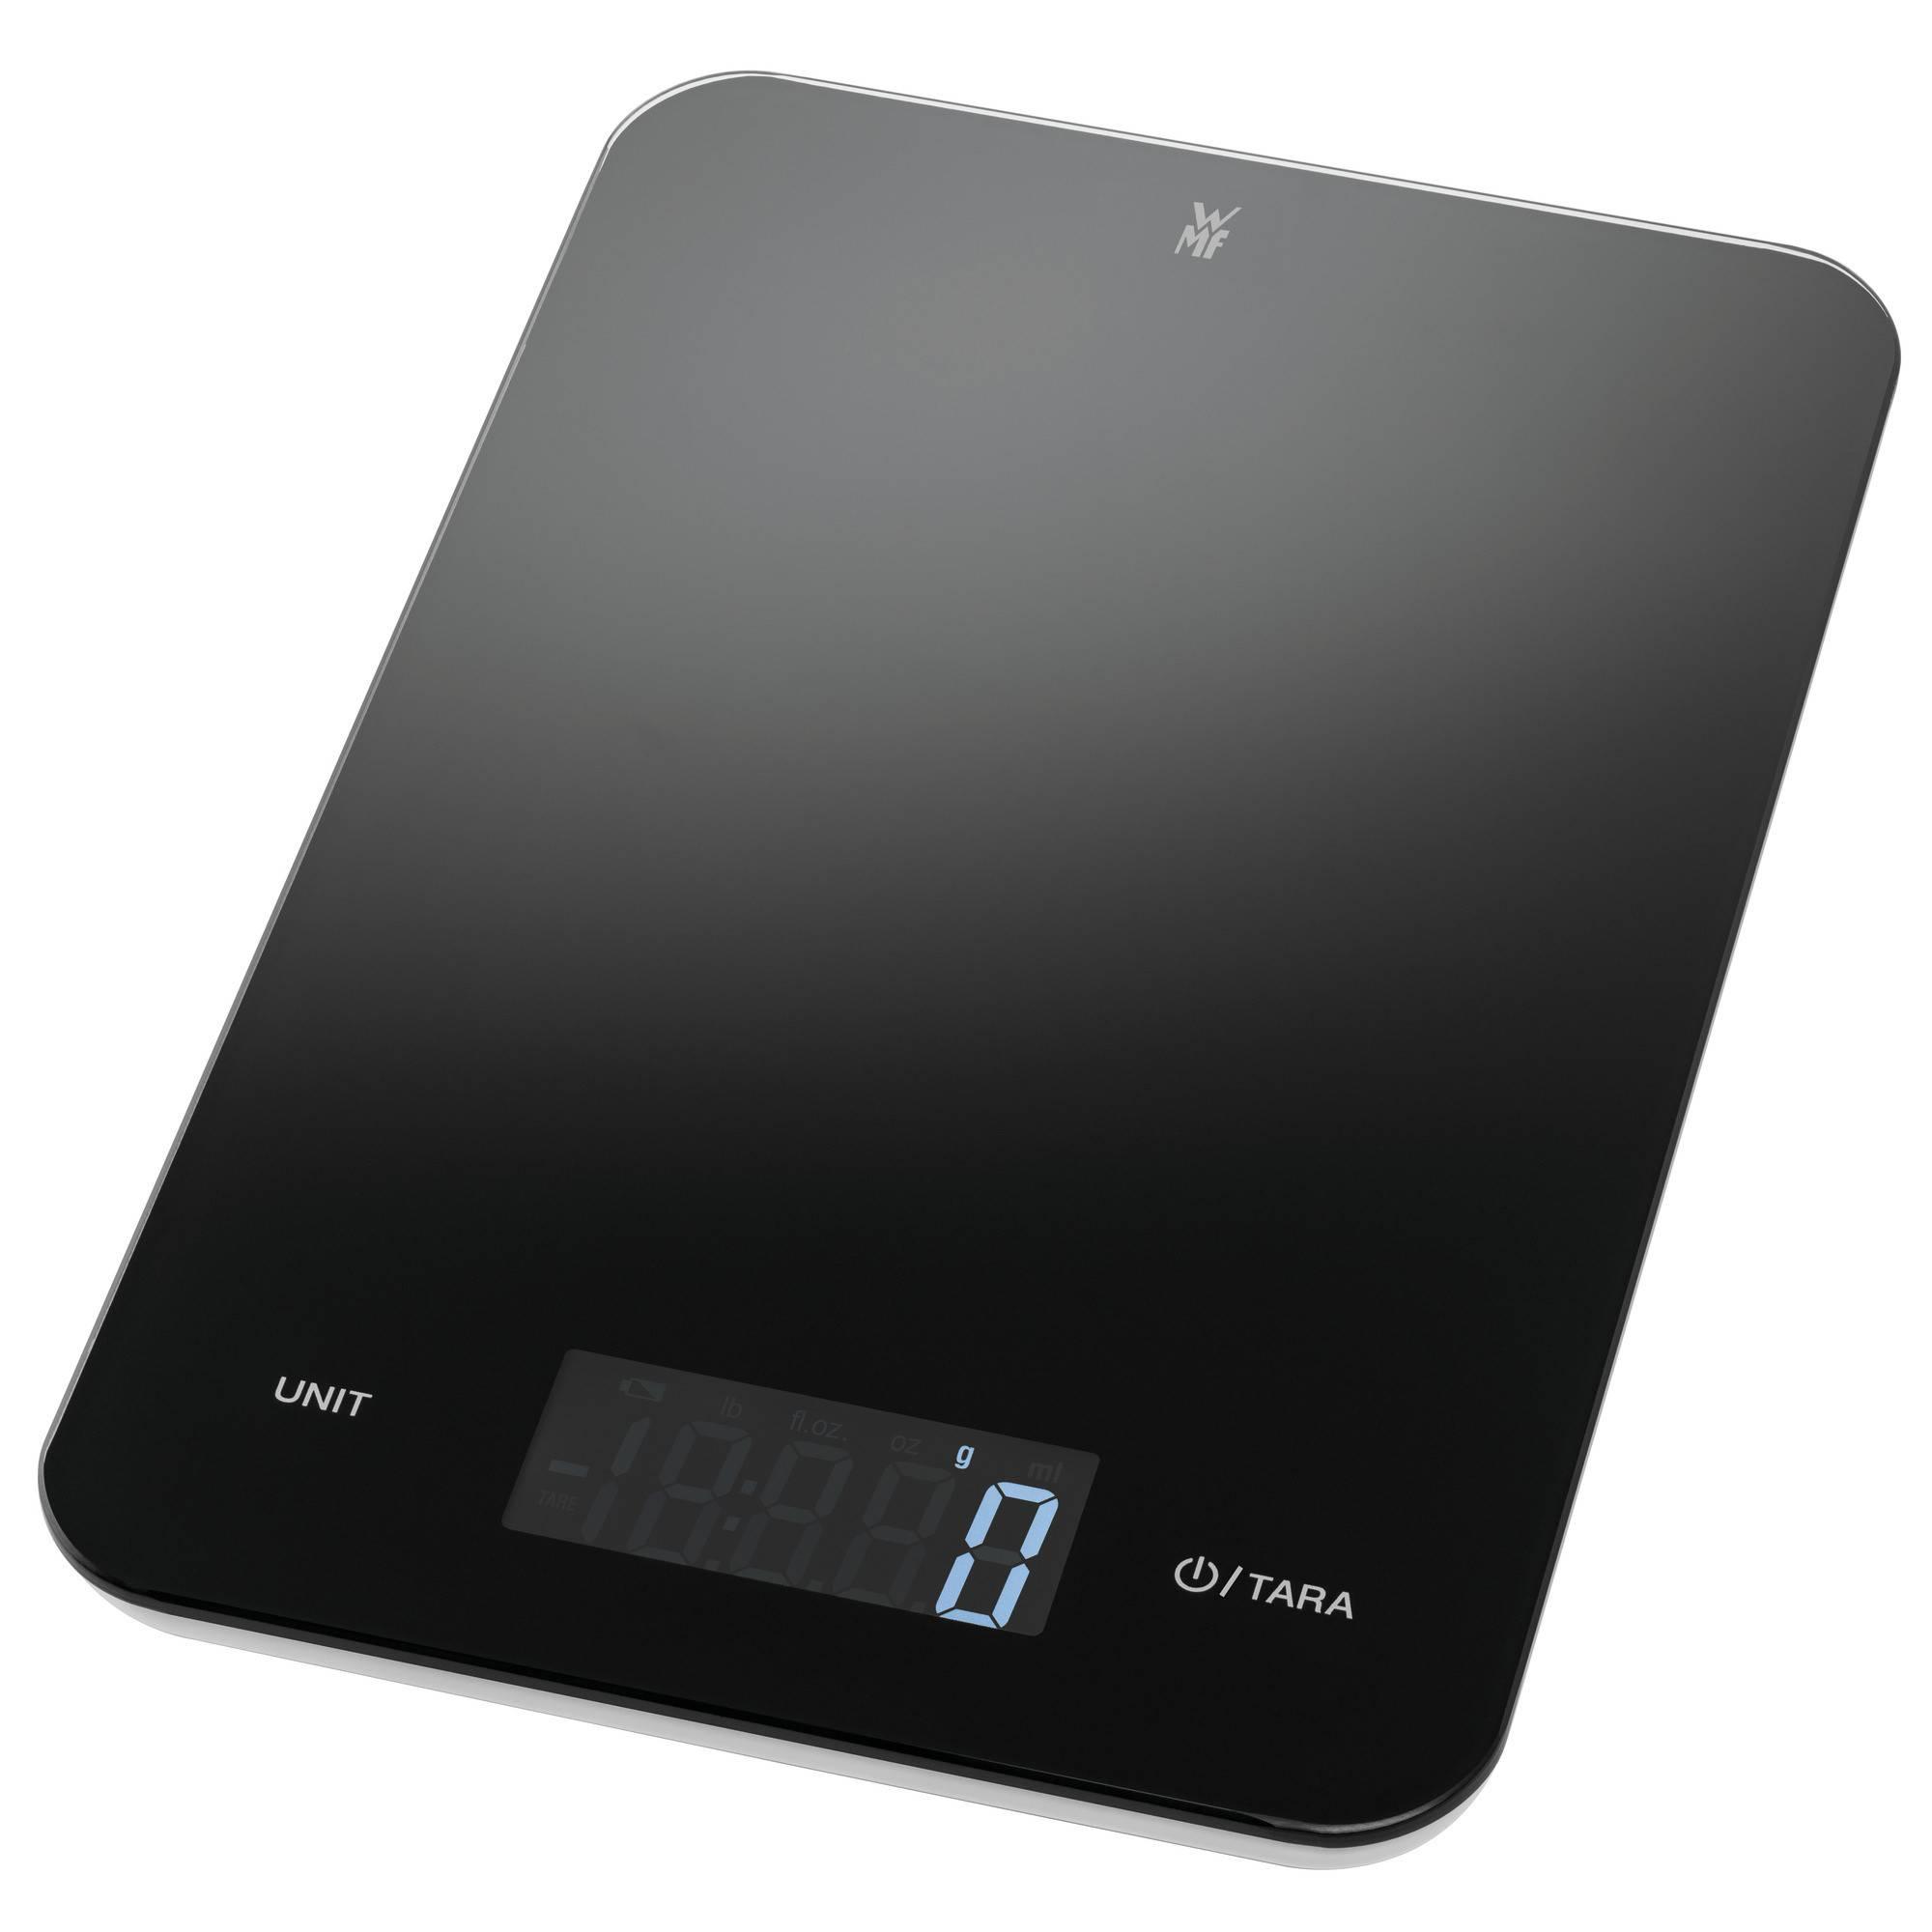 Kuchynská digitálna váha WMF čierna